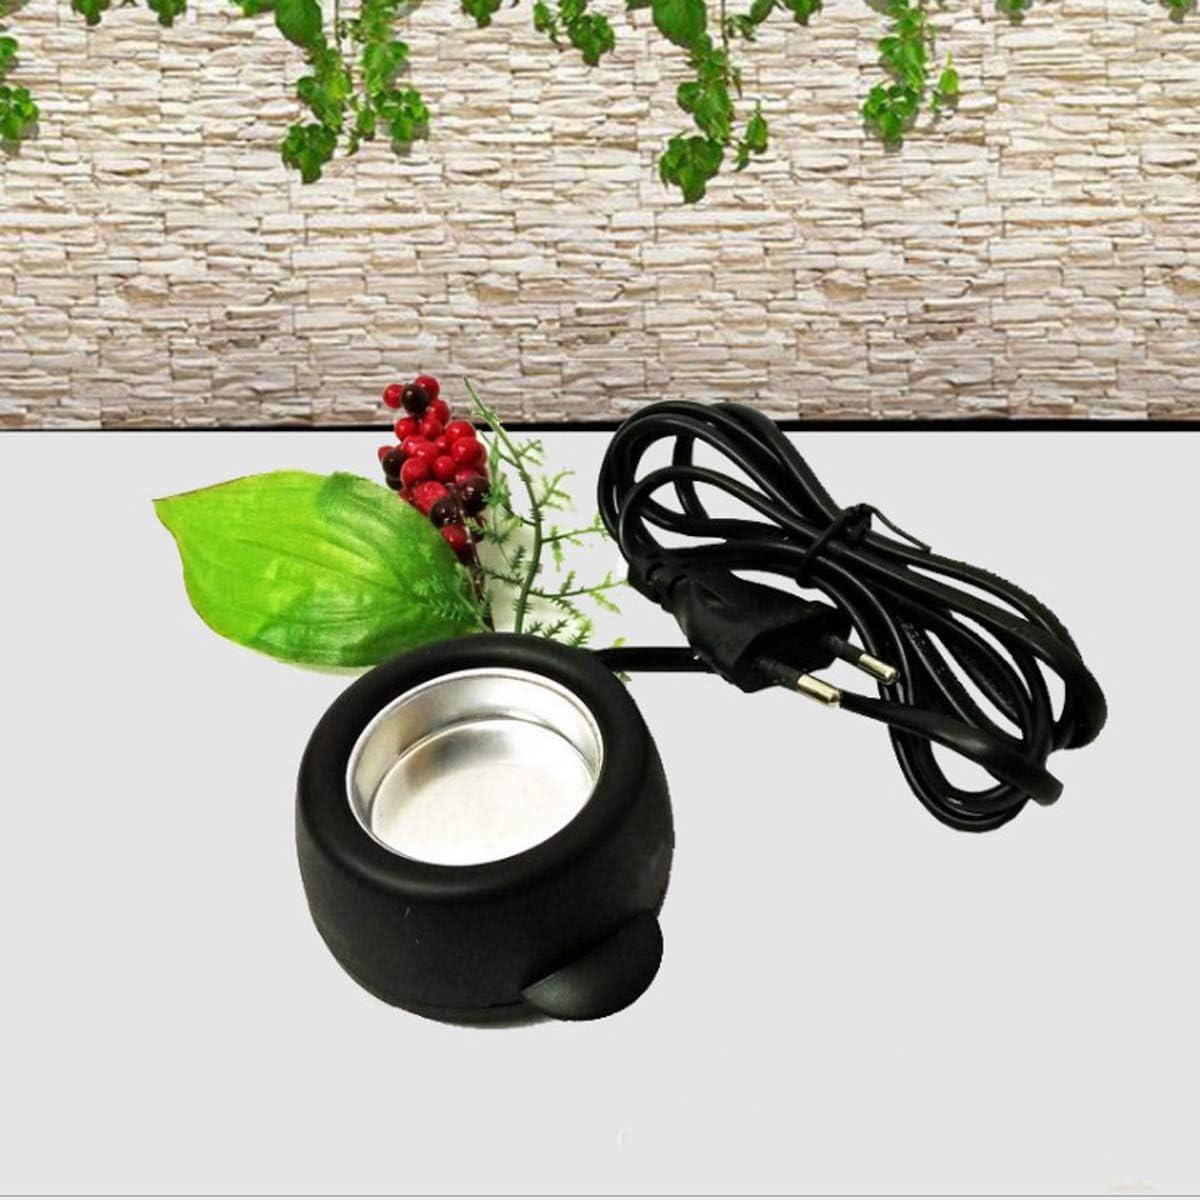 2.5*1.4in Taplong Haarverl/ängerung Kleber Topf Hei/ßkleber Schmelzen 30 W Mini Konstante Temperatur Hot Pot Schmelzen Kleber Topf Glue Ofen UK//EU-Stecker